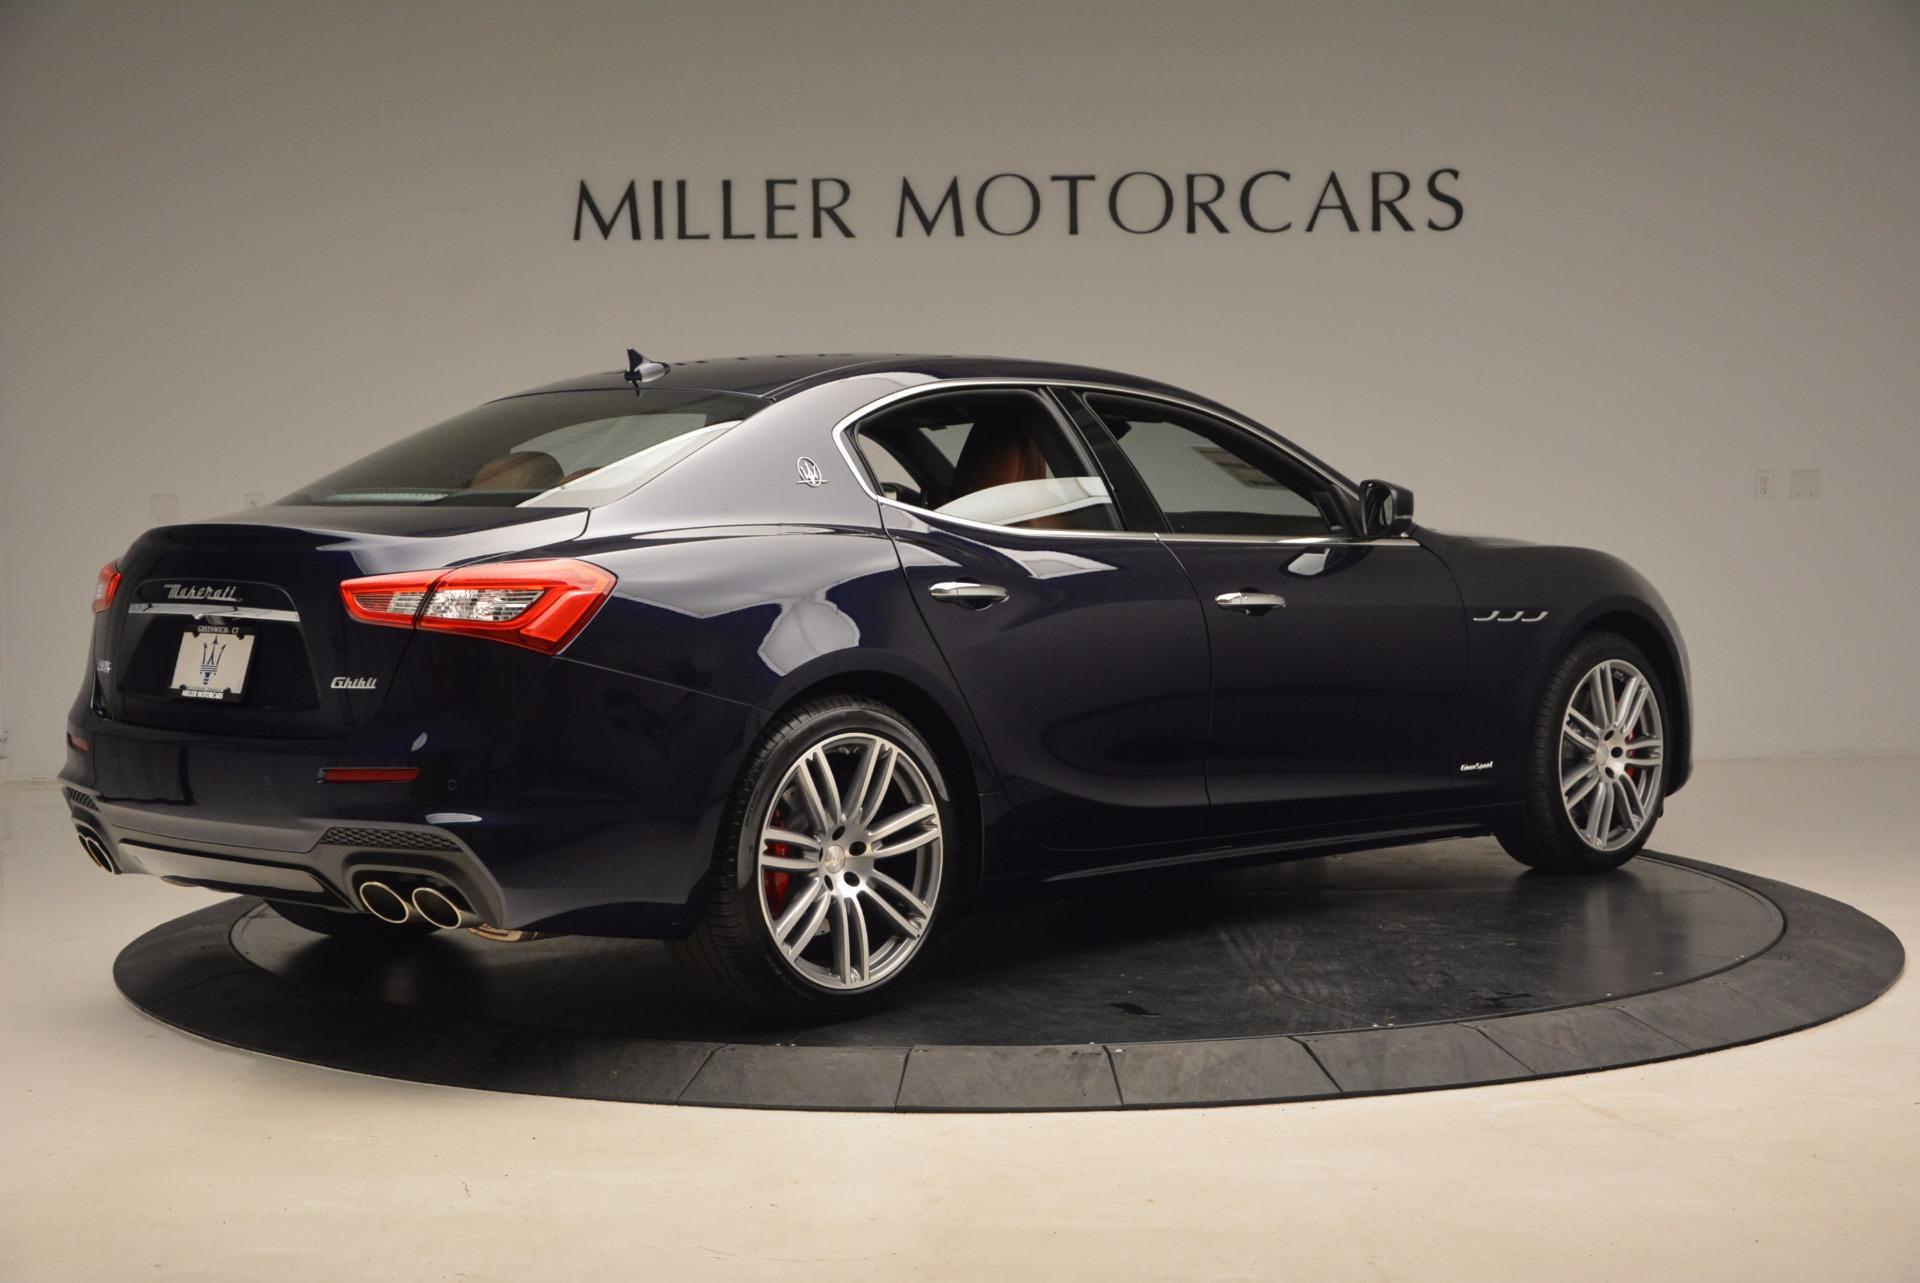 New 2018 Maserati Ghibli S Q4 Gransport For Sale In Greenwich, CT 1562_p8